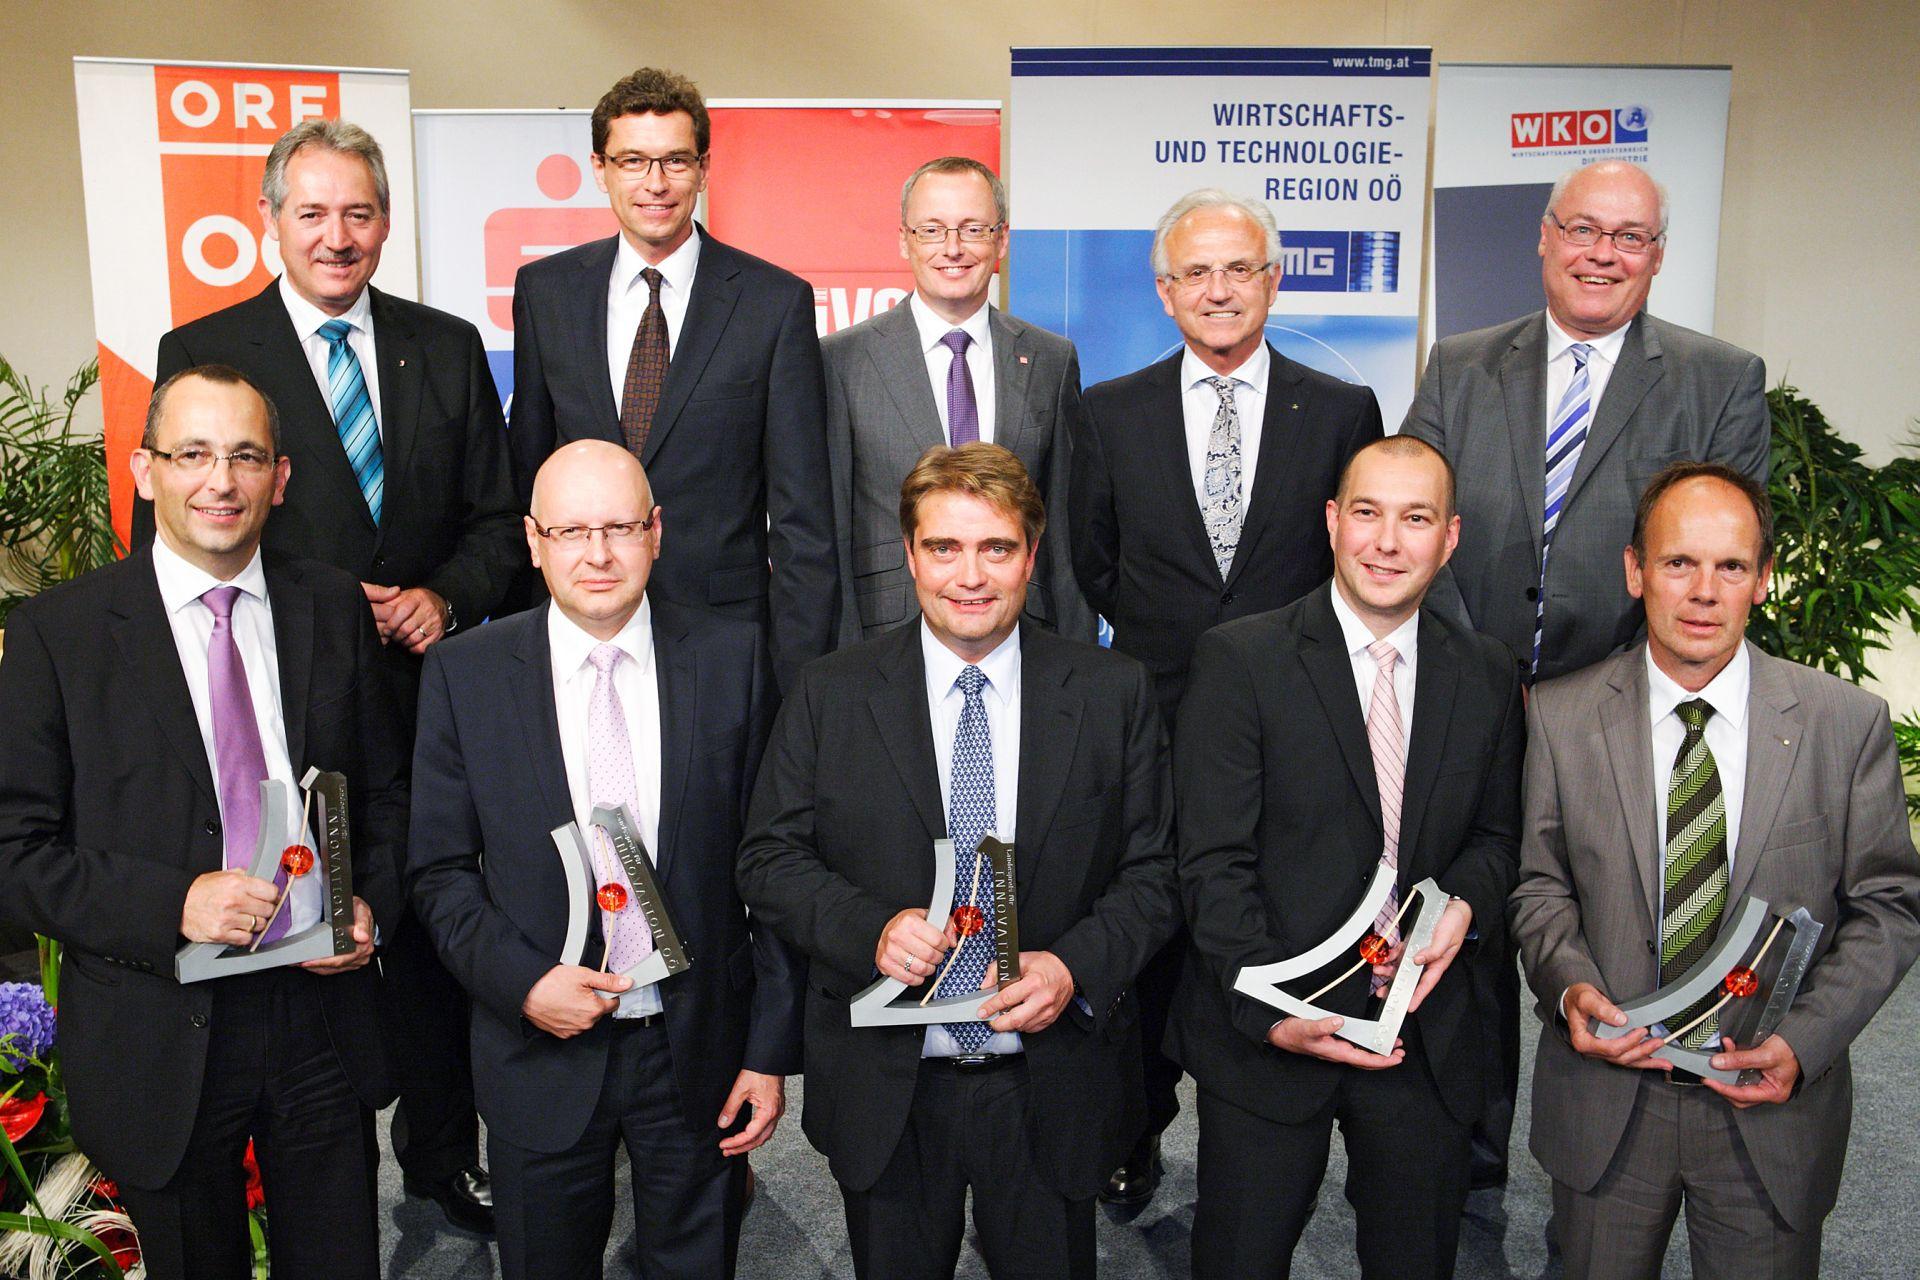 Alois Pöttinger Maschinenfabrik GmbH | Innovationspreis 2011